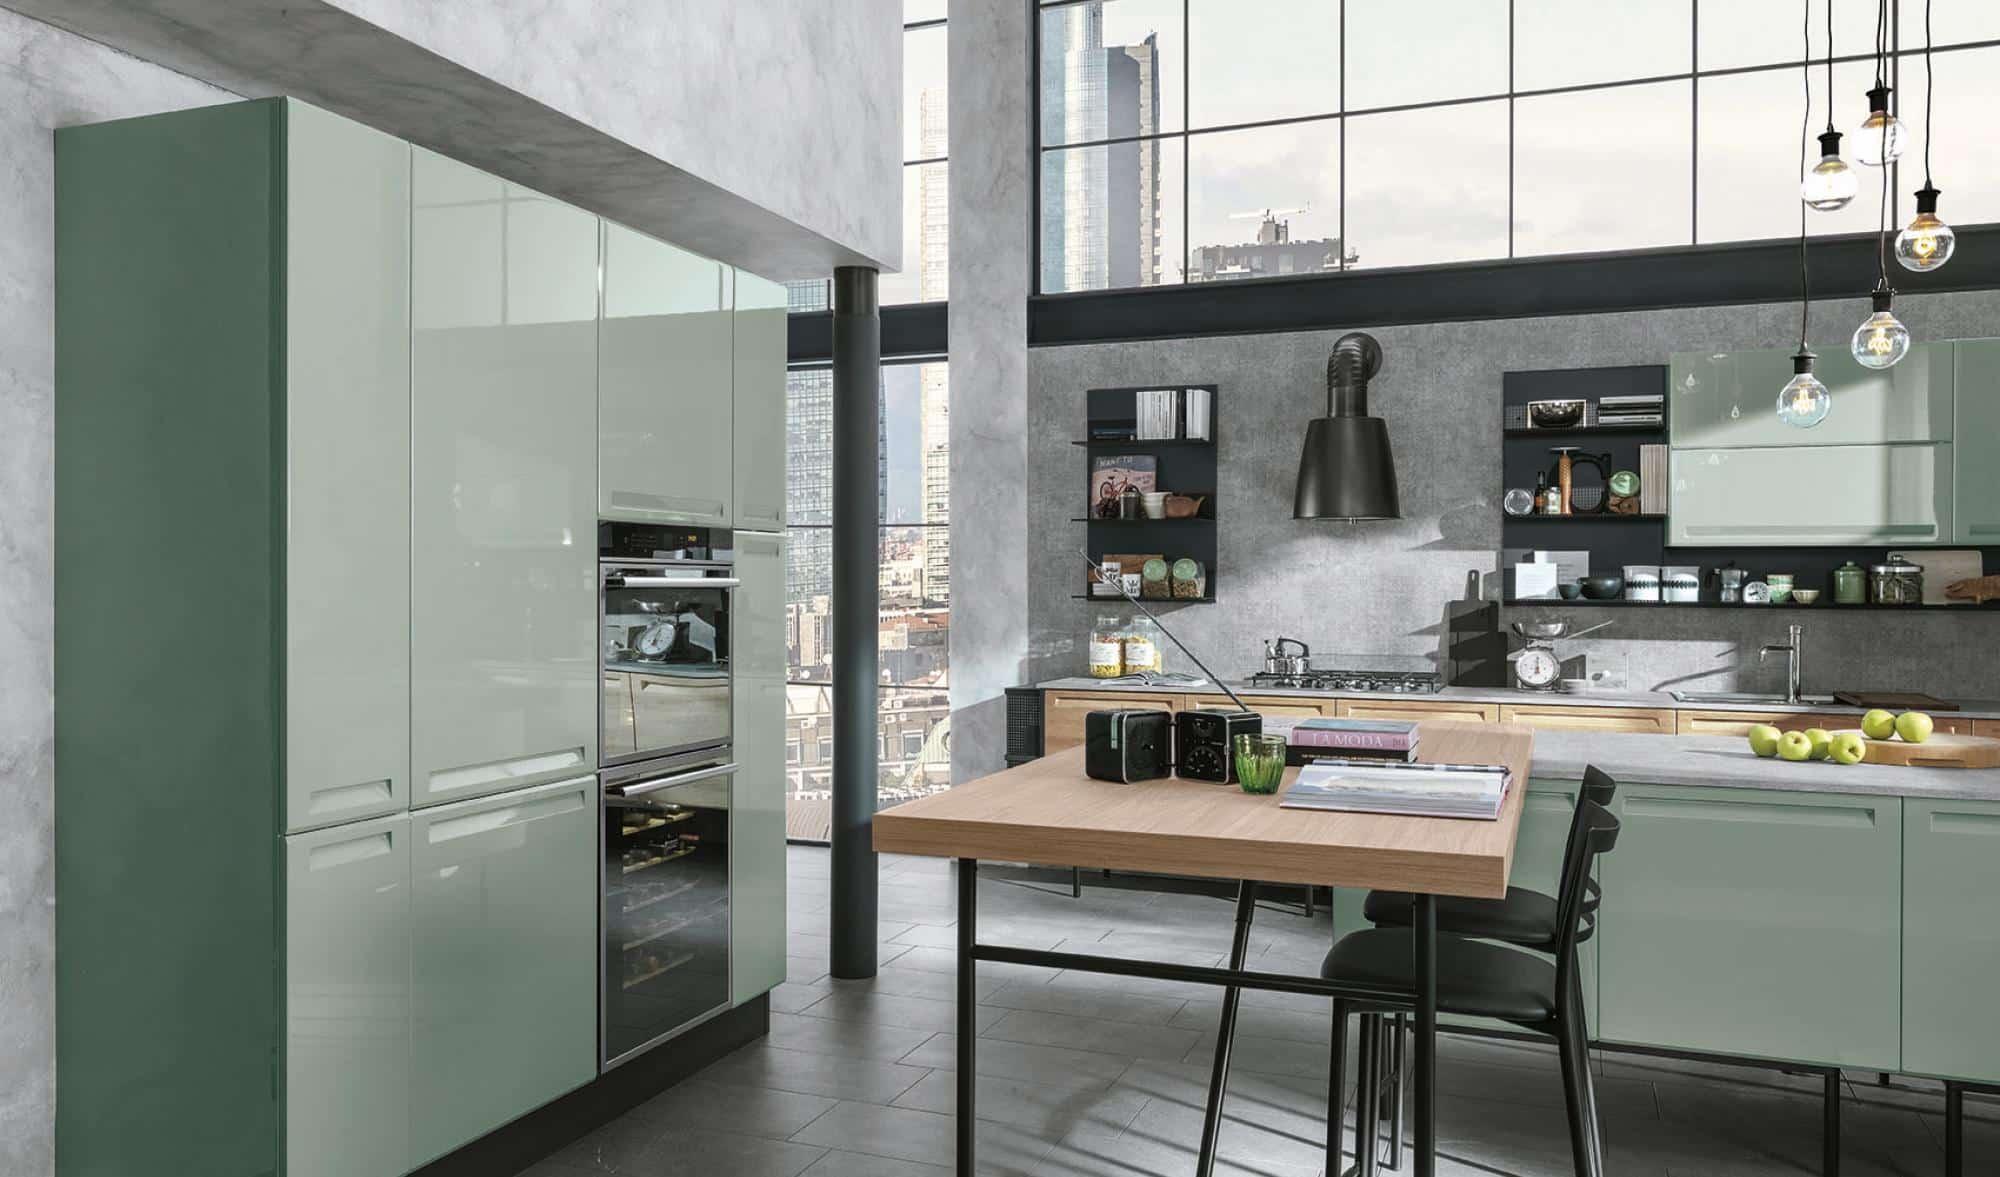 Isla κουζινα βεραμαν πρασσινο πολυμερικο με ενσωματωμενη λαβη και ρετρο υφος